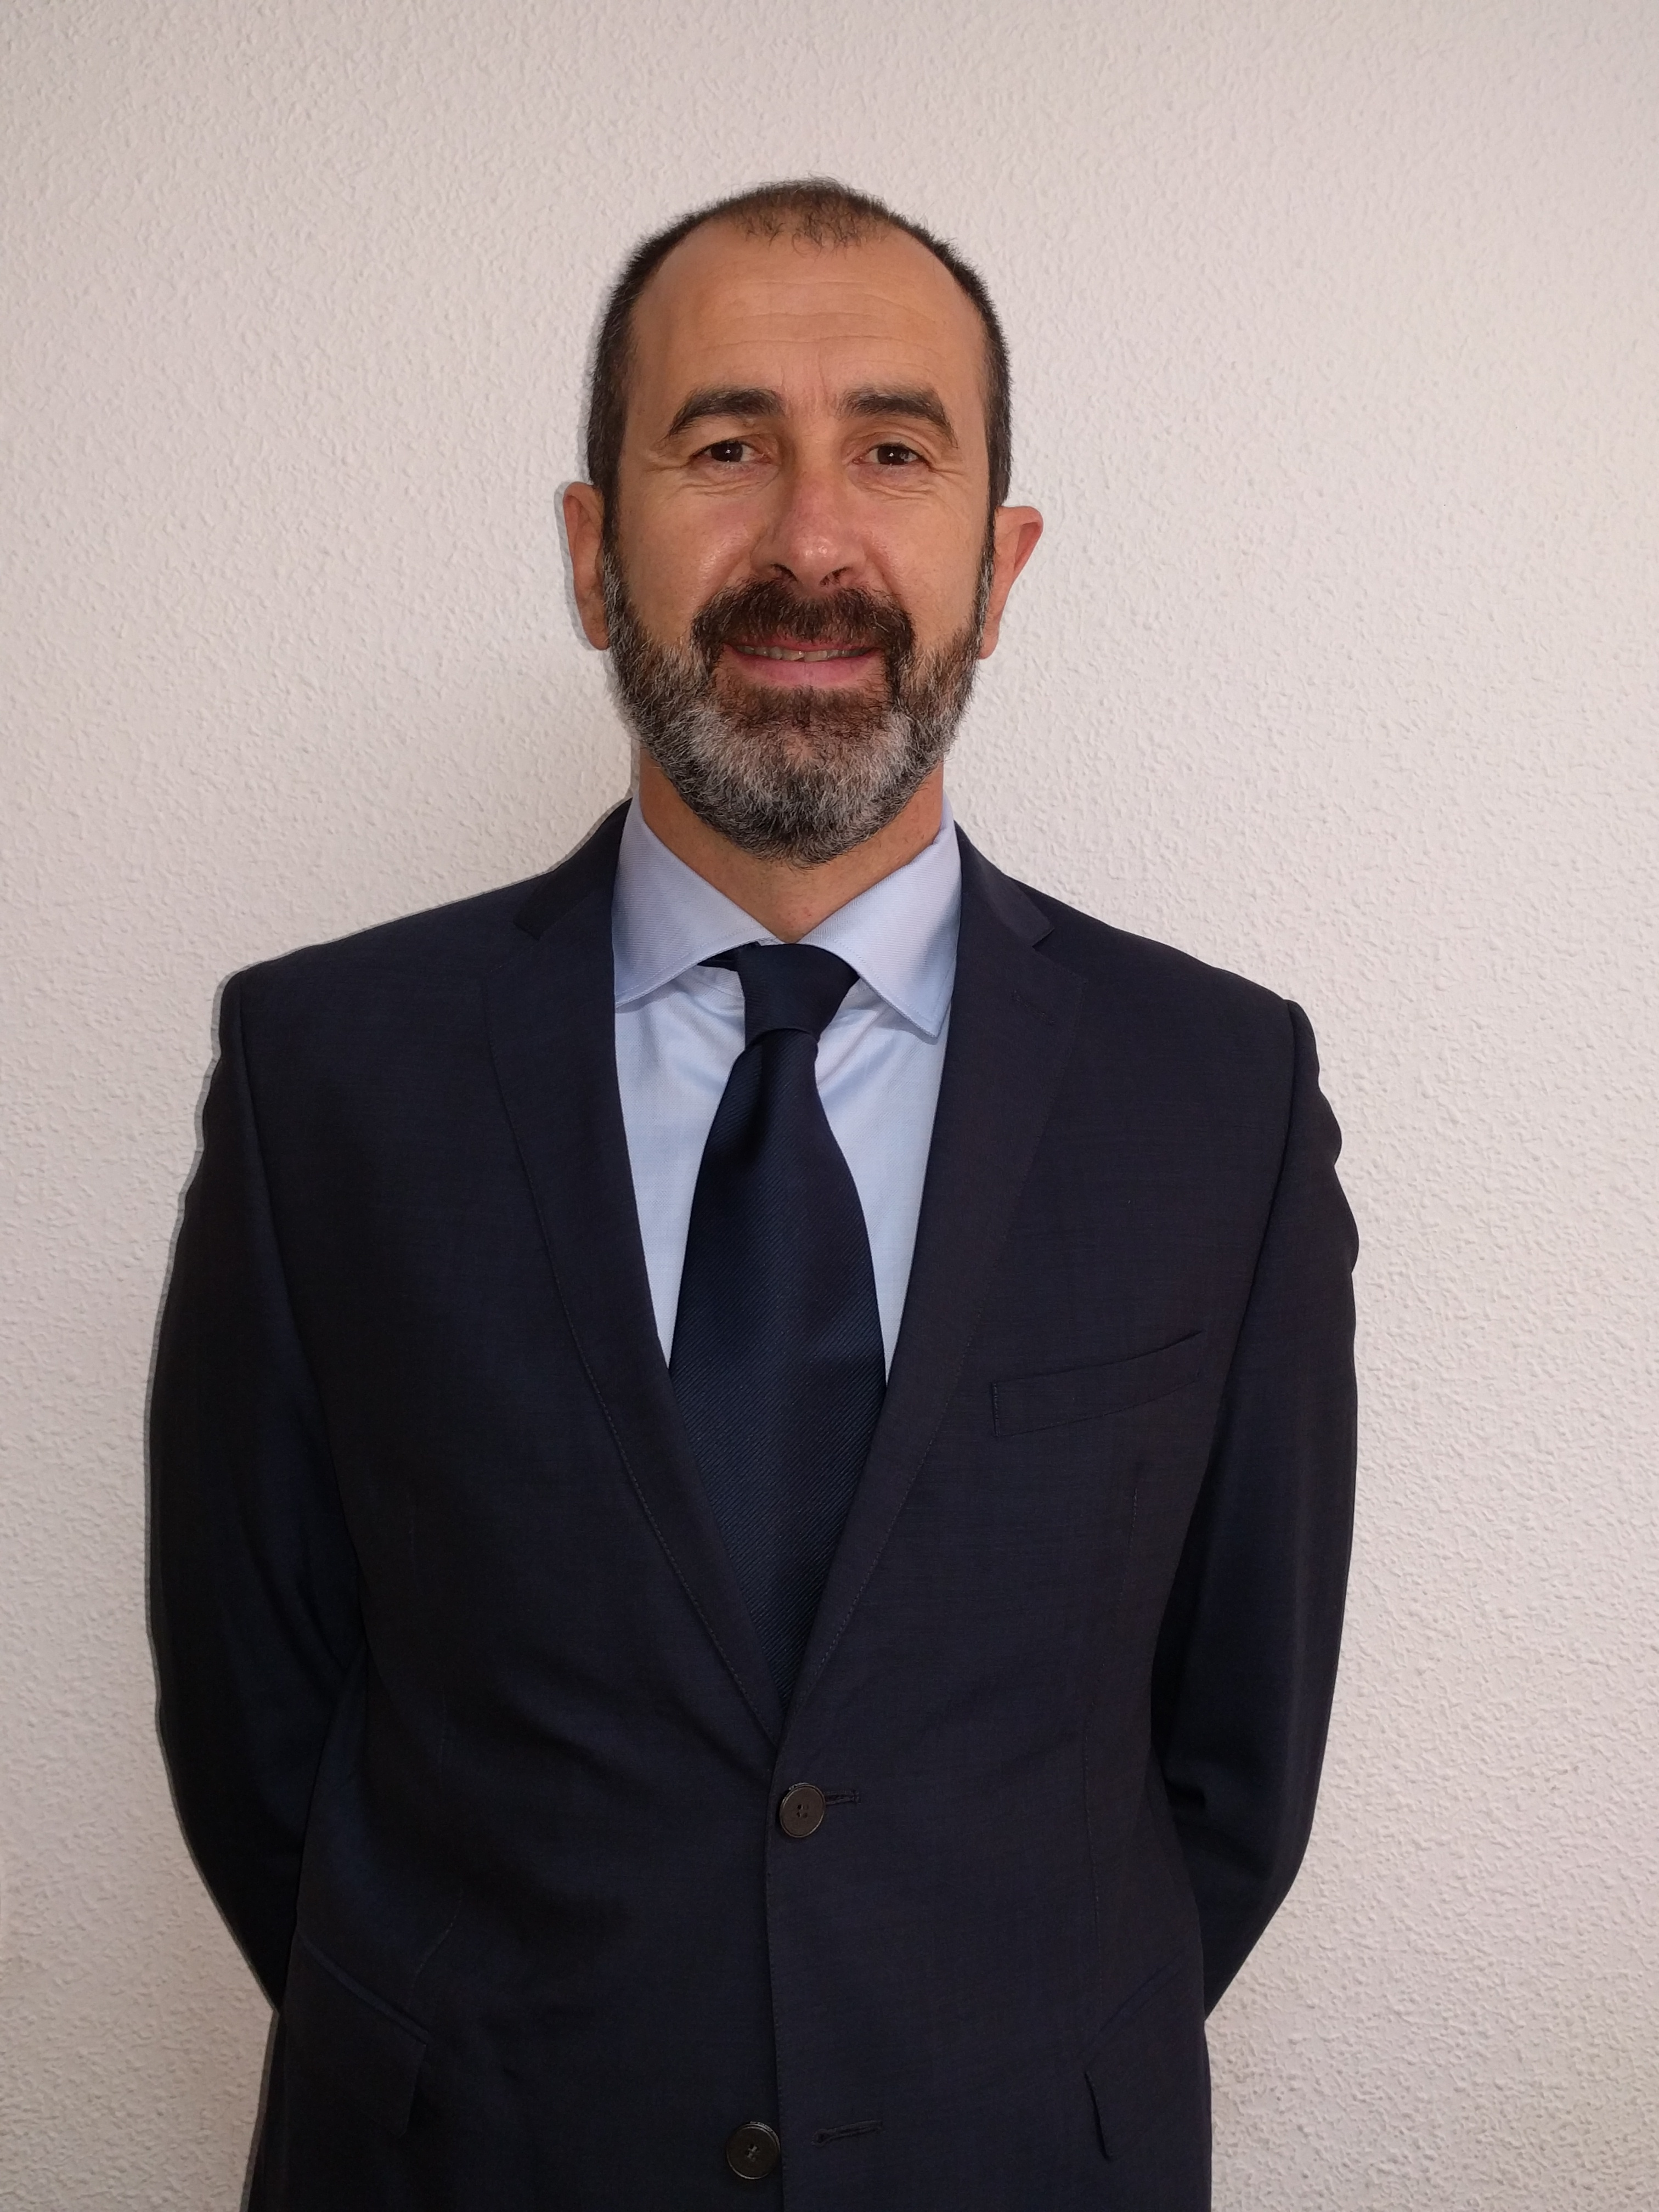 ANDRES MANUEL NATAL PRIETO